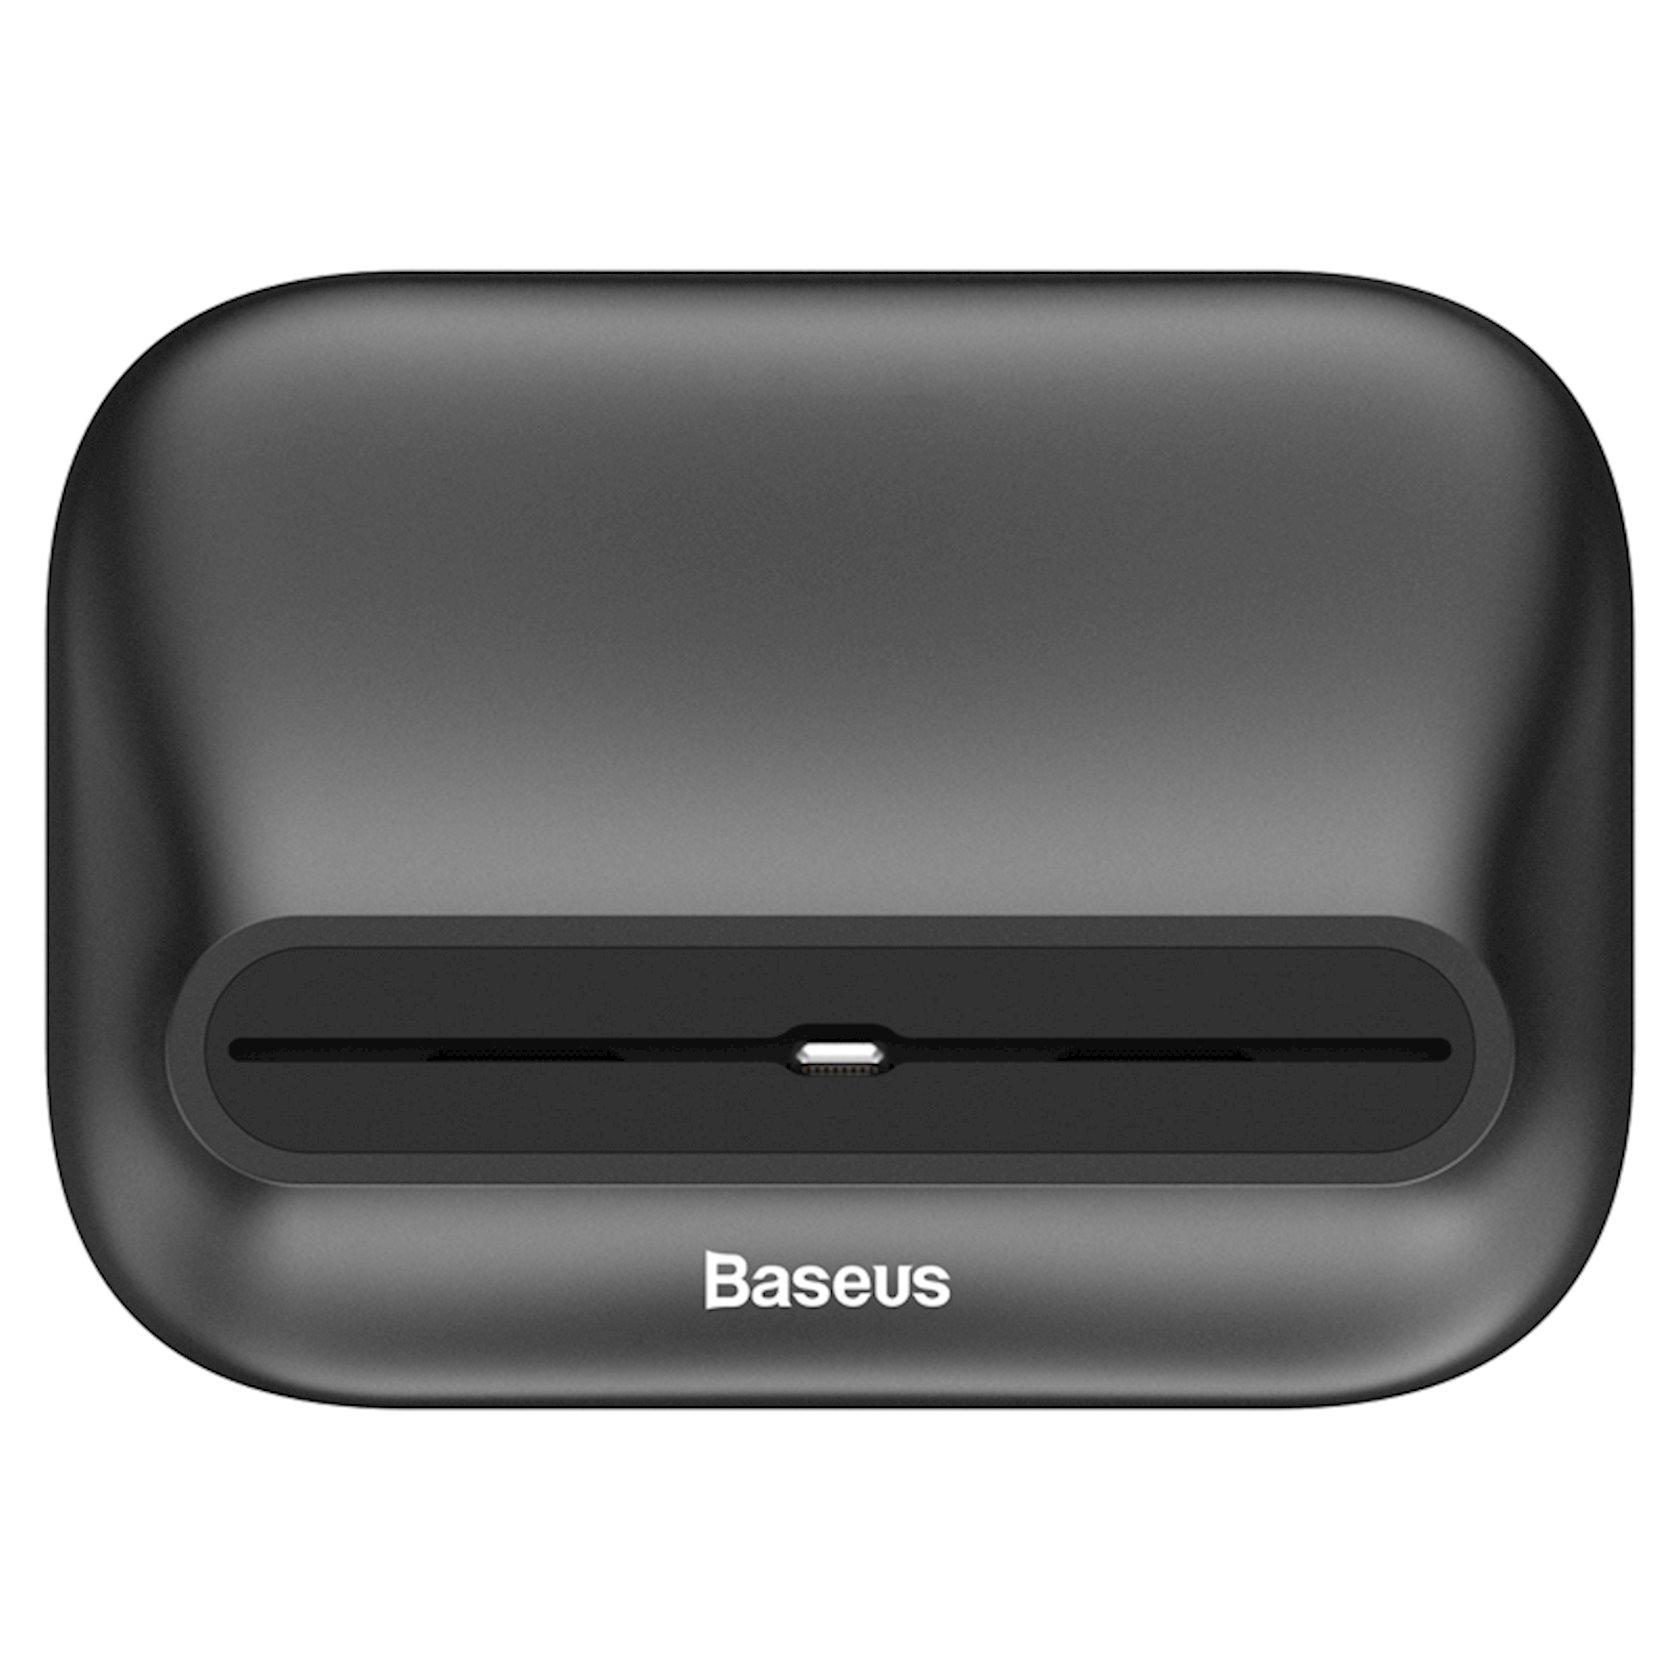 Dok-stansiya Baseus iPhone üçün  Little Volcano Desk Charging Station